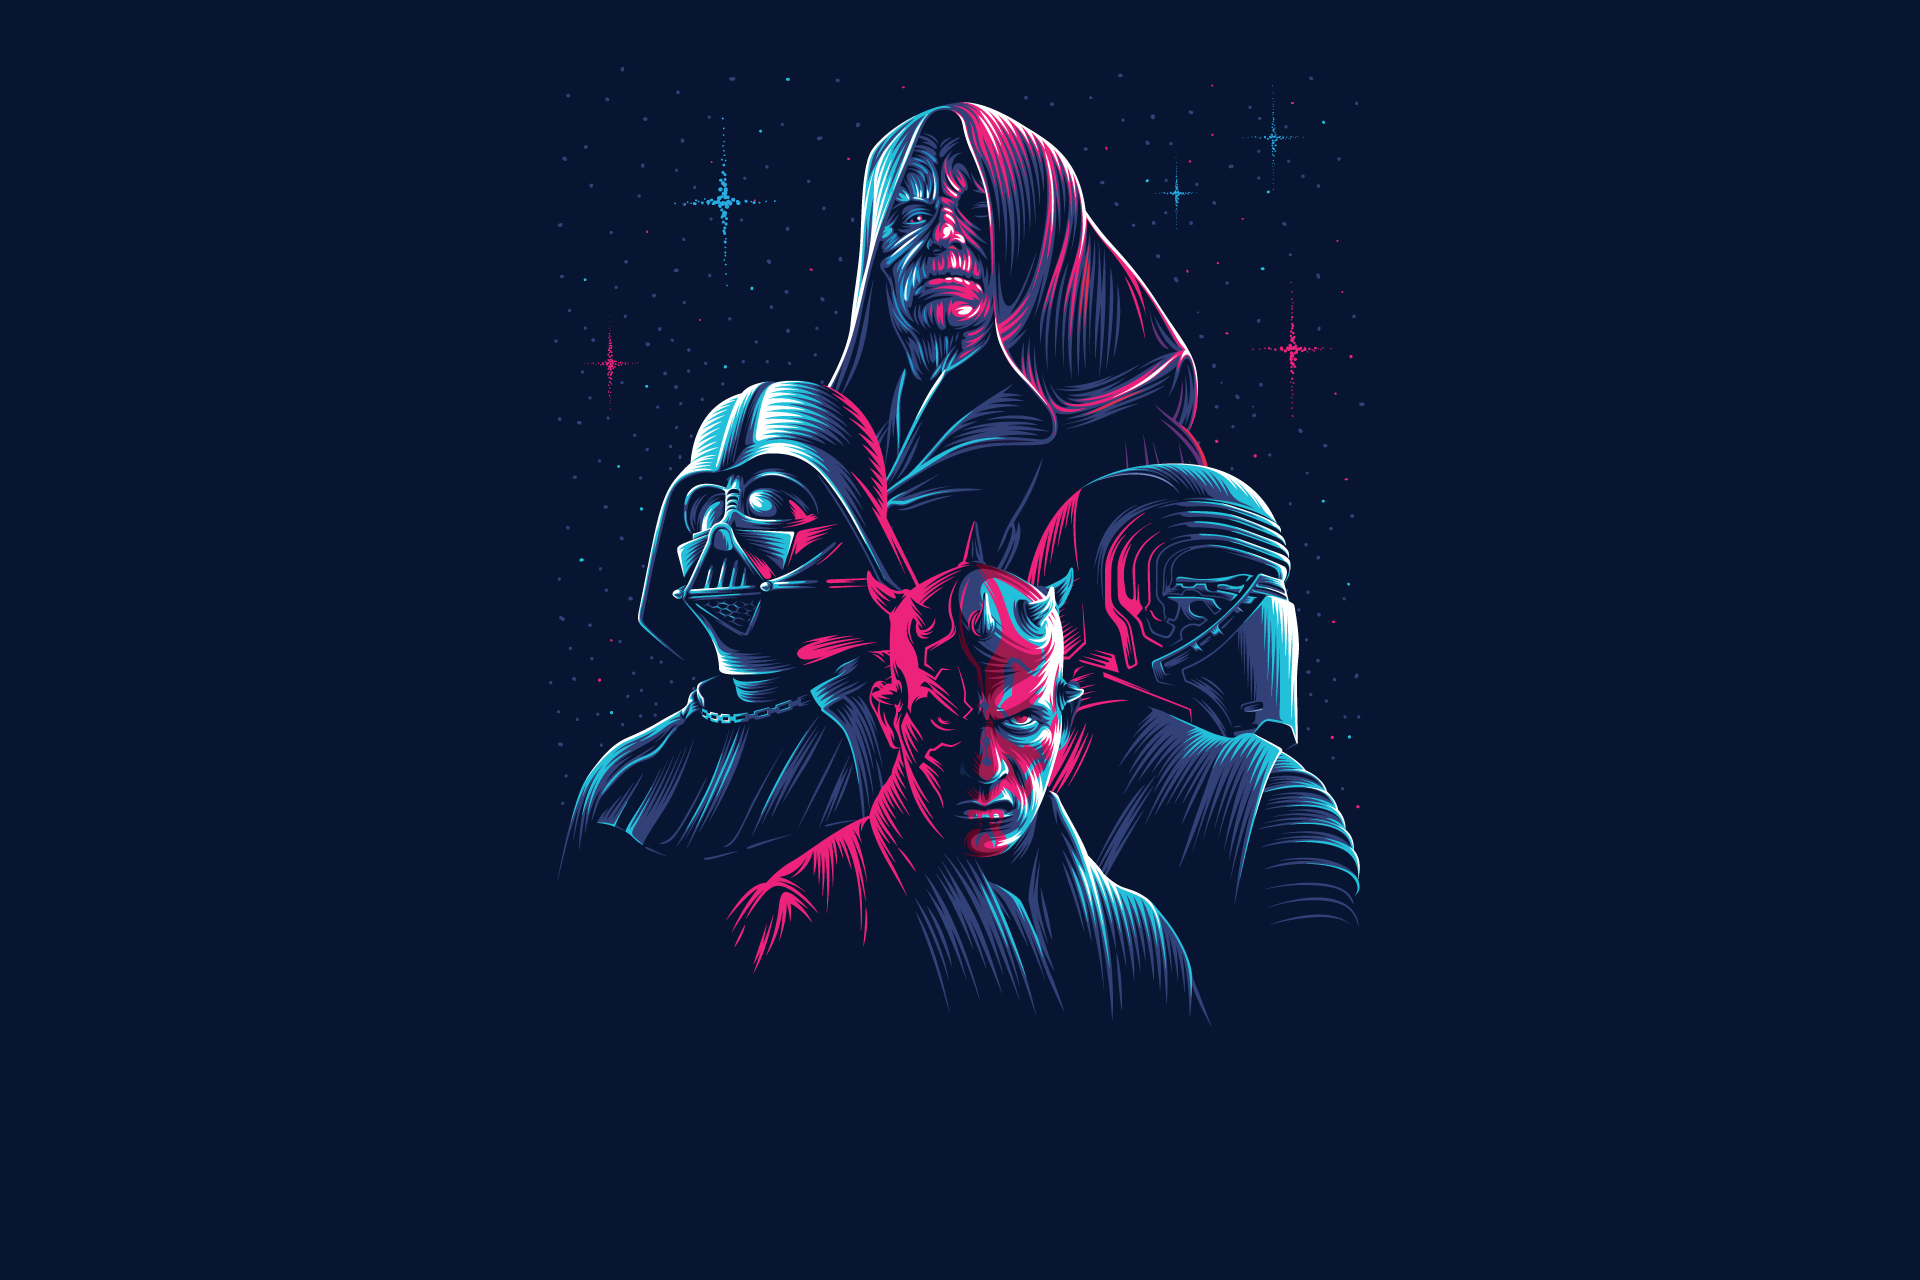 Star Wars Dark Side Wallpaper Hd Movies 4k Wallpapers Images